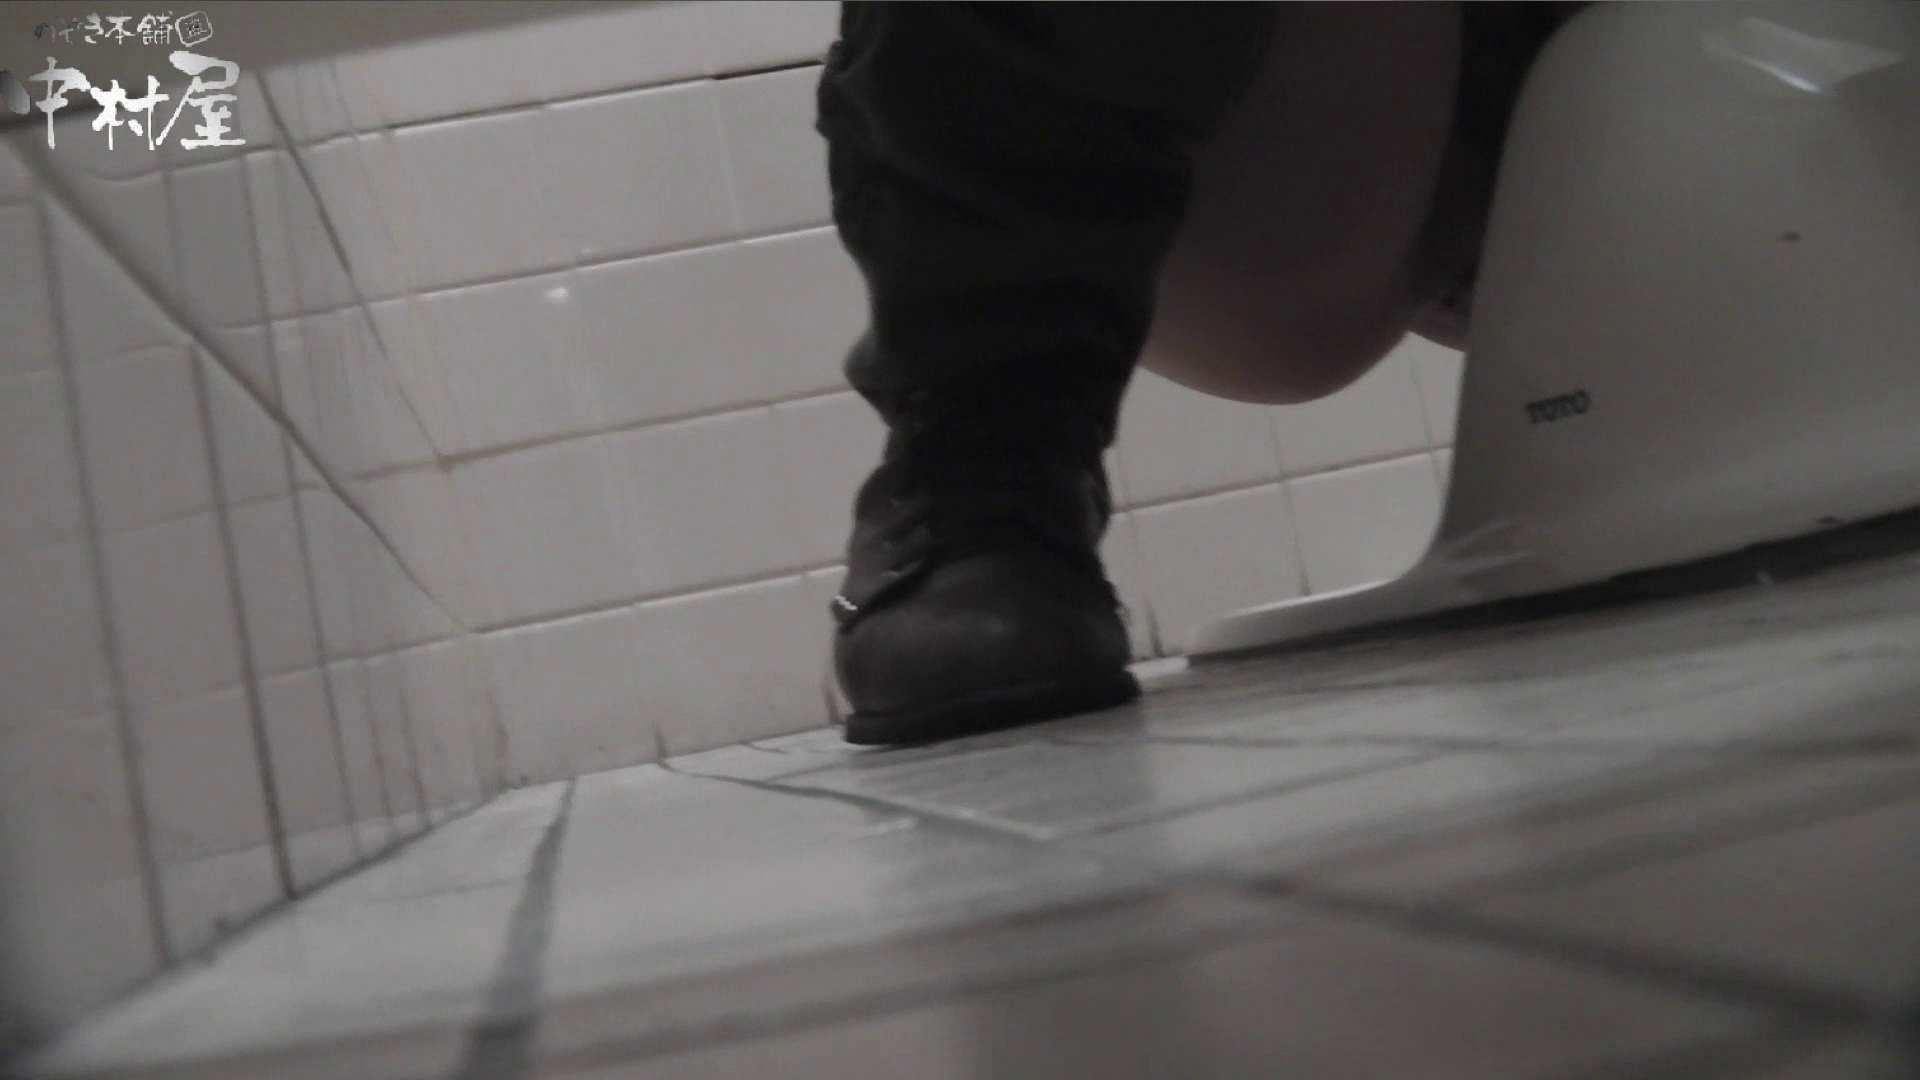 vol.34 命がけ潜伏洗面所! アソコの毛が長髪な件 後編 洗面所 盗撮エロ画像 107画像 2